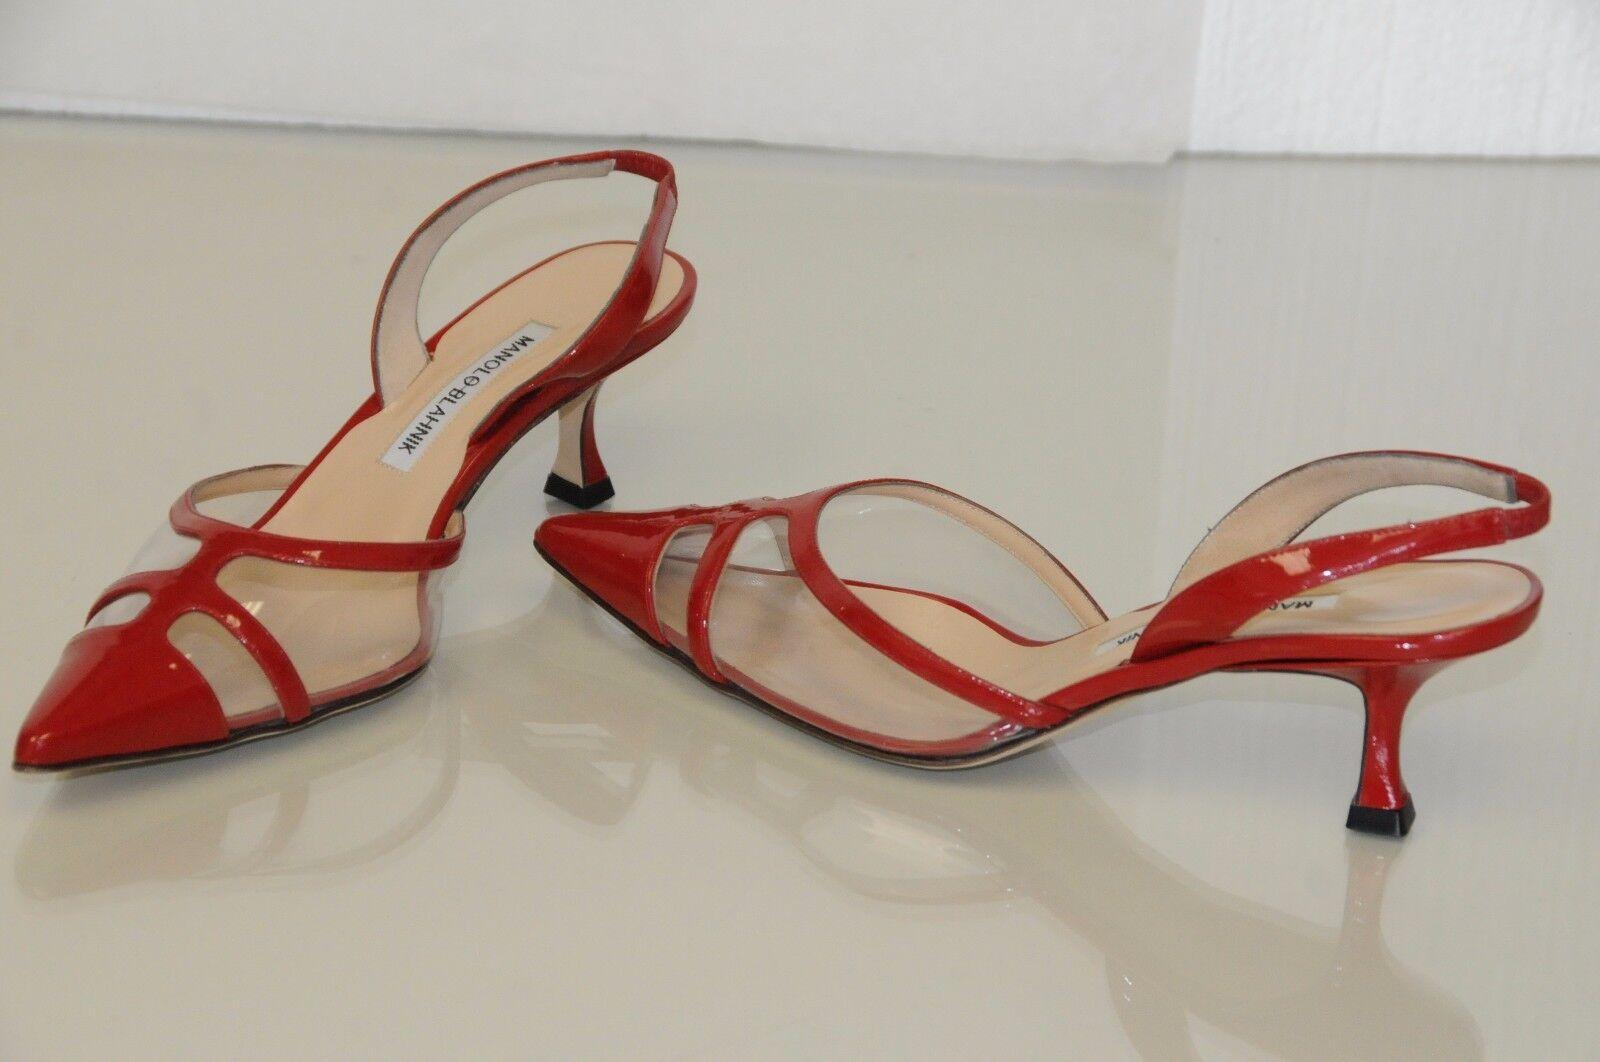 New MANOLO BLAHNIK Carolyne rouge Patent PVC Kitten Heels chaussures 36 38 40